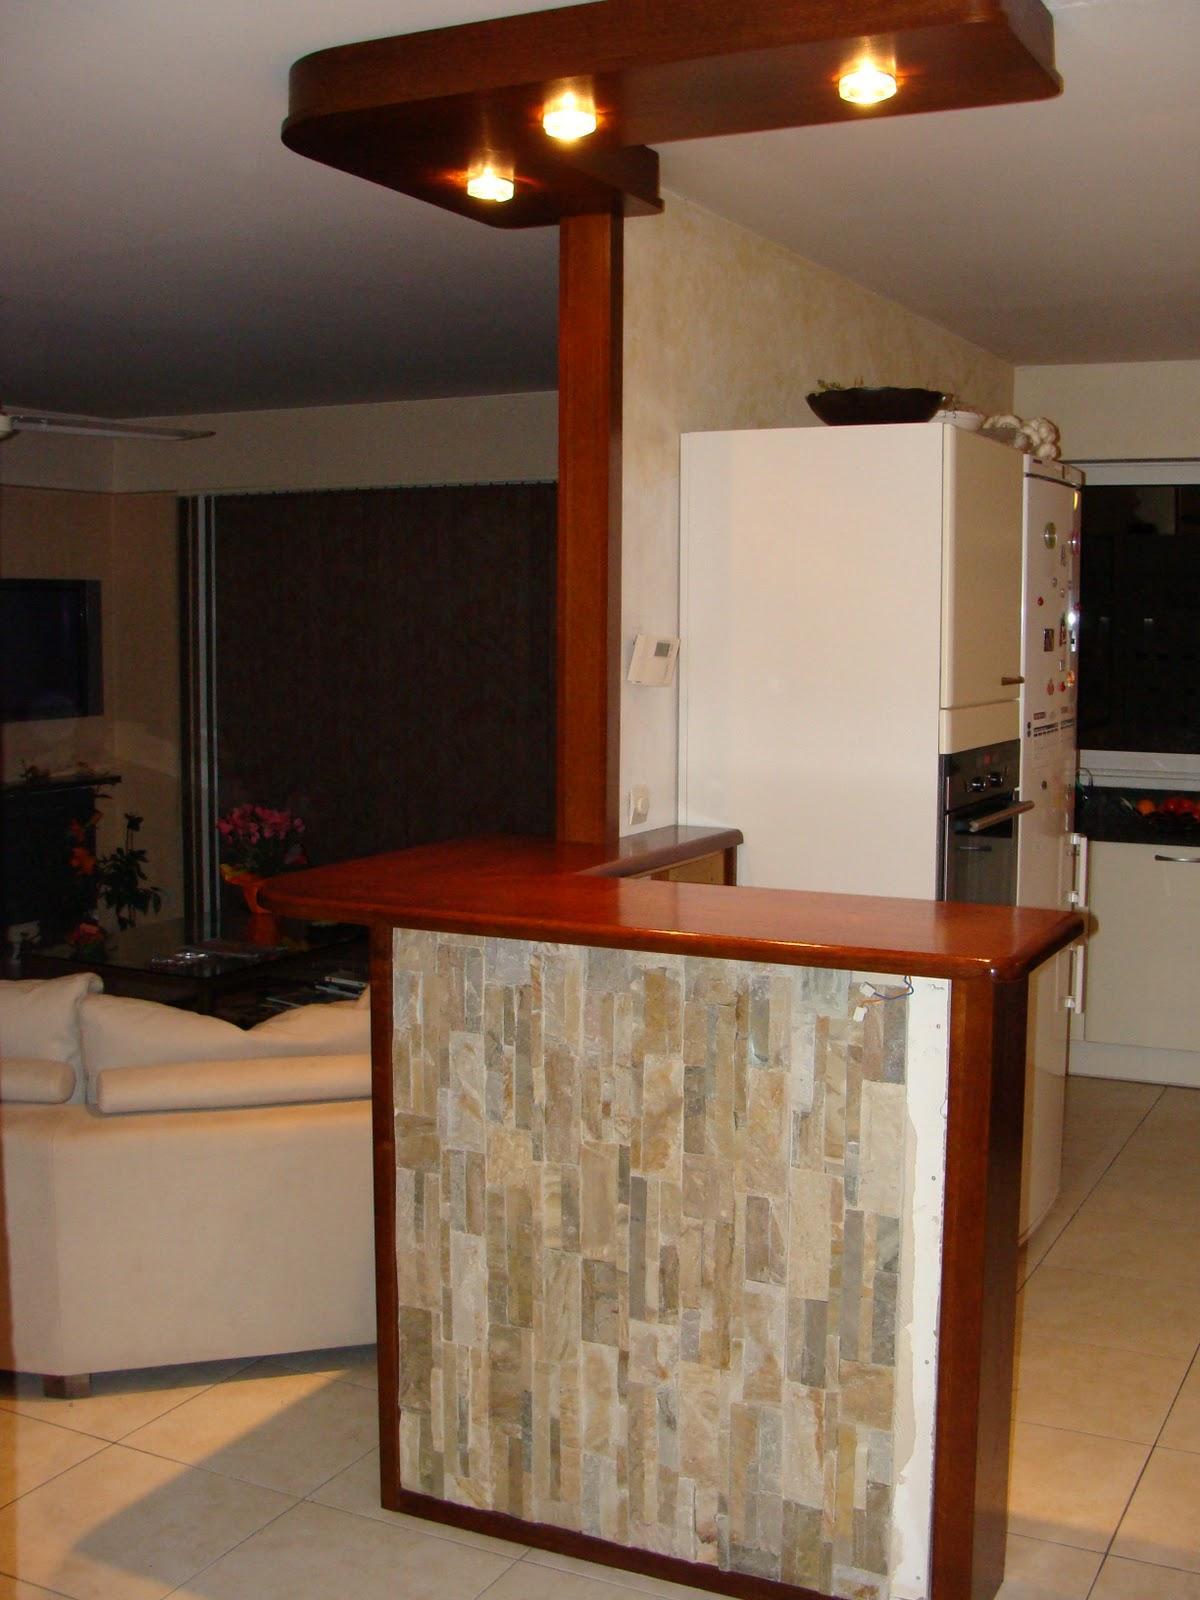 profil contre profil janvier 2011. Black Bedroom Furniture Sets. Home Design Ideas